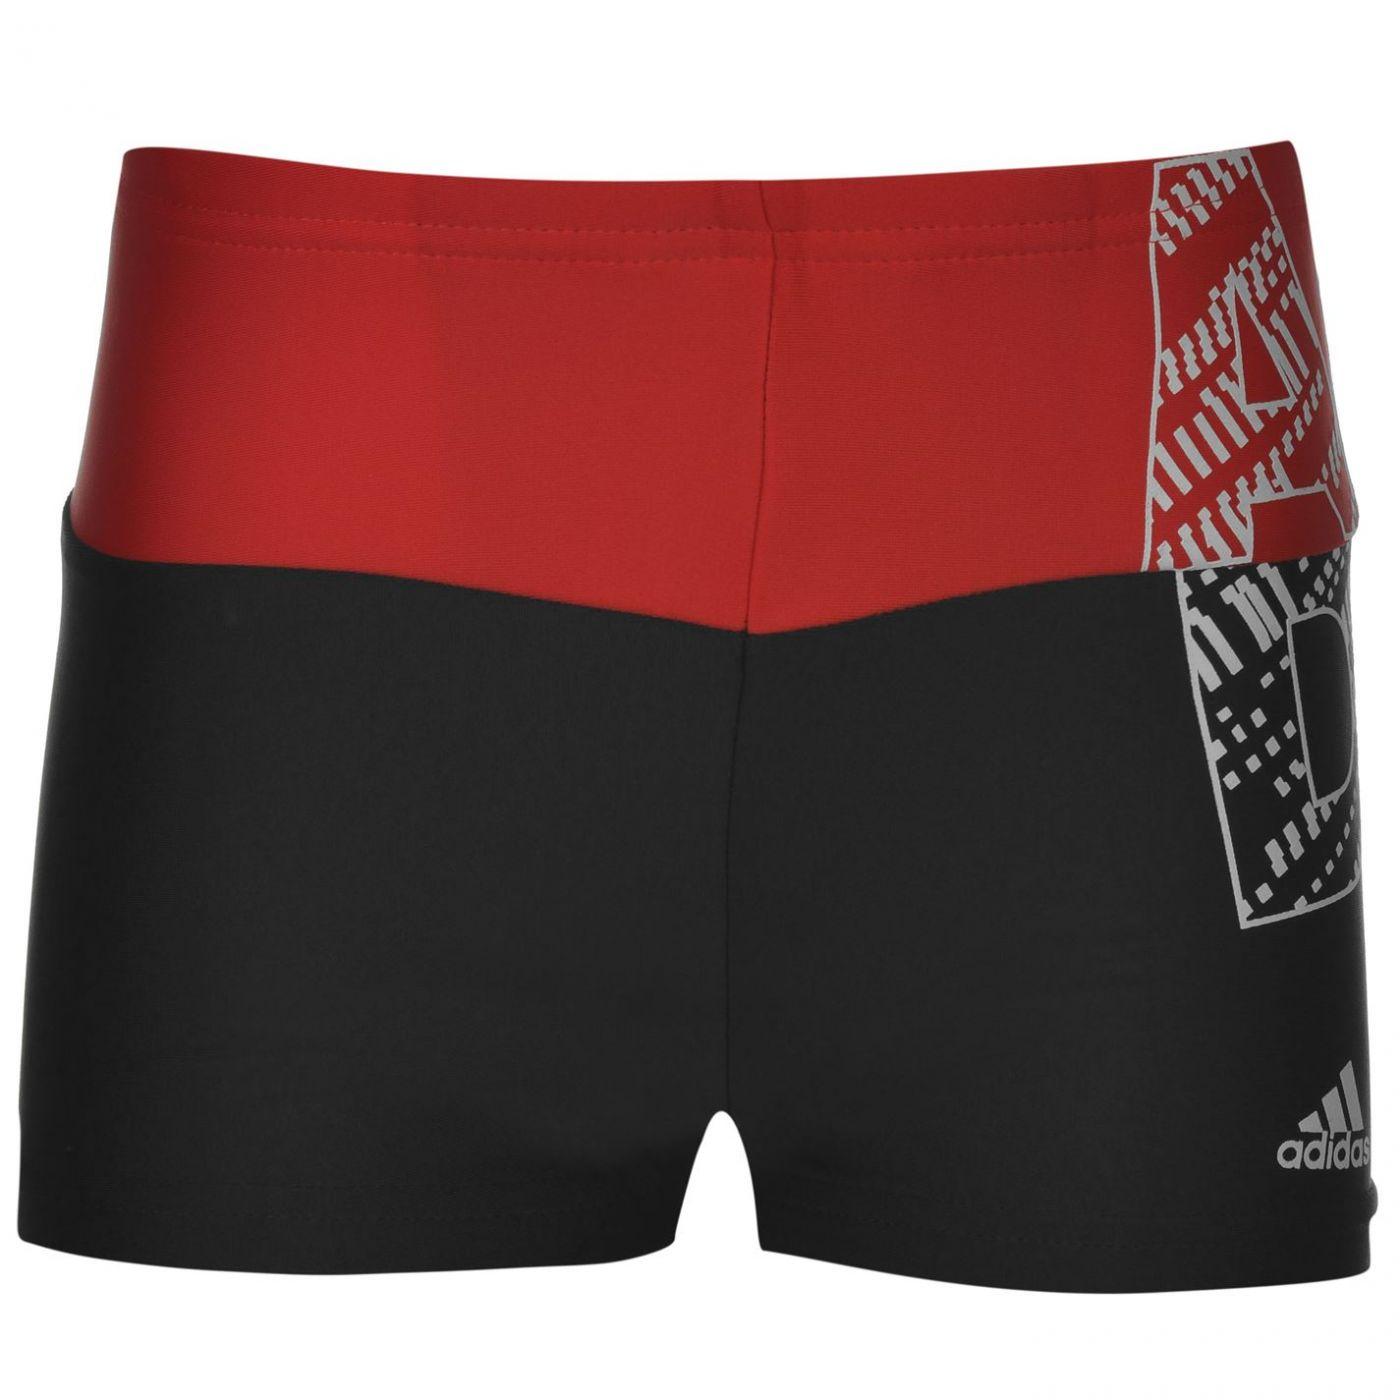 2d70c141b68f1 adidas BTS Boxer Swim Shorts Junior Boys - FACTCOOL